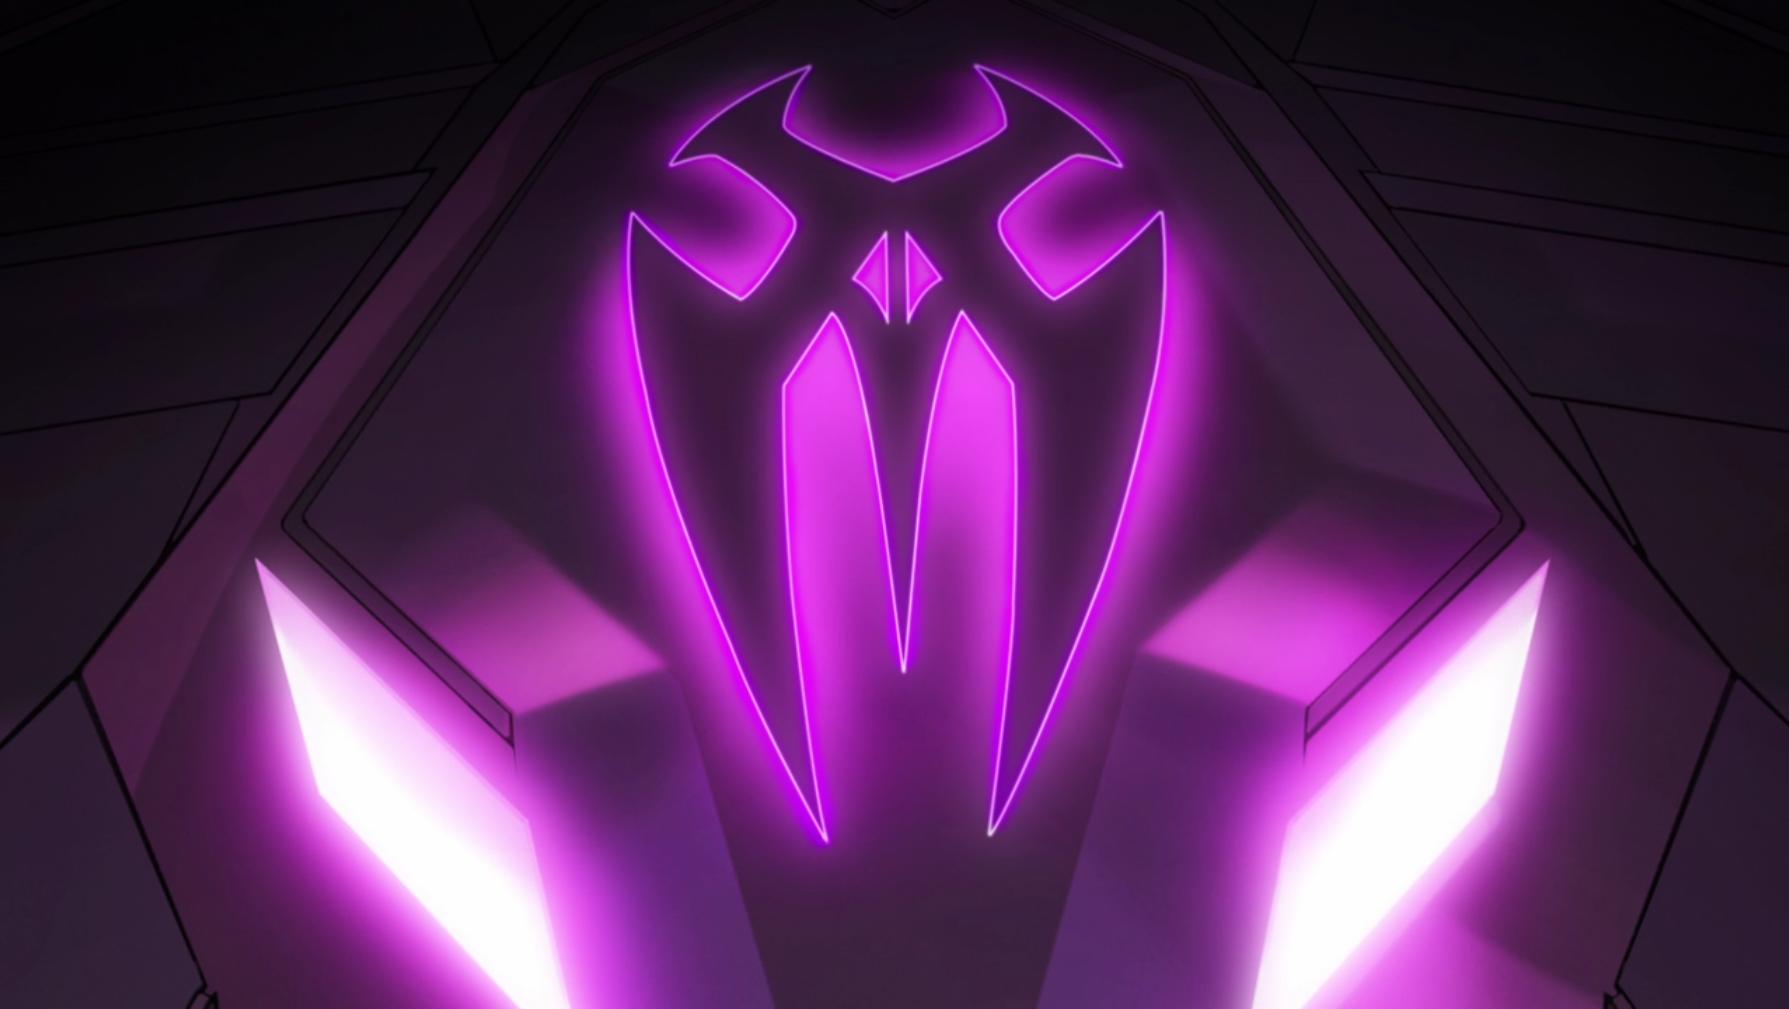 The galra empire vs the irken empire spacebattles forums galra empire voltron legendary defender img biocorpaavc